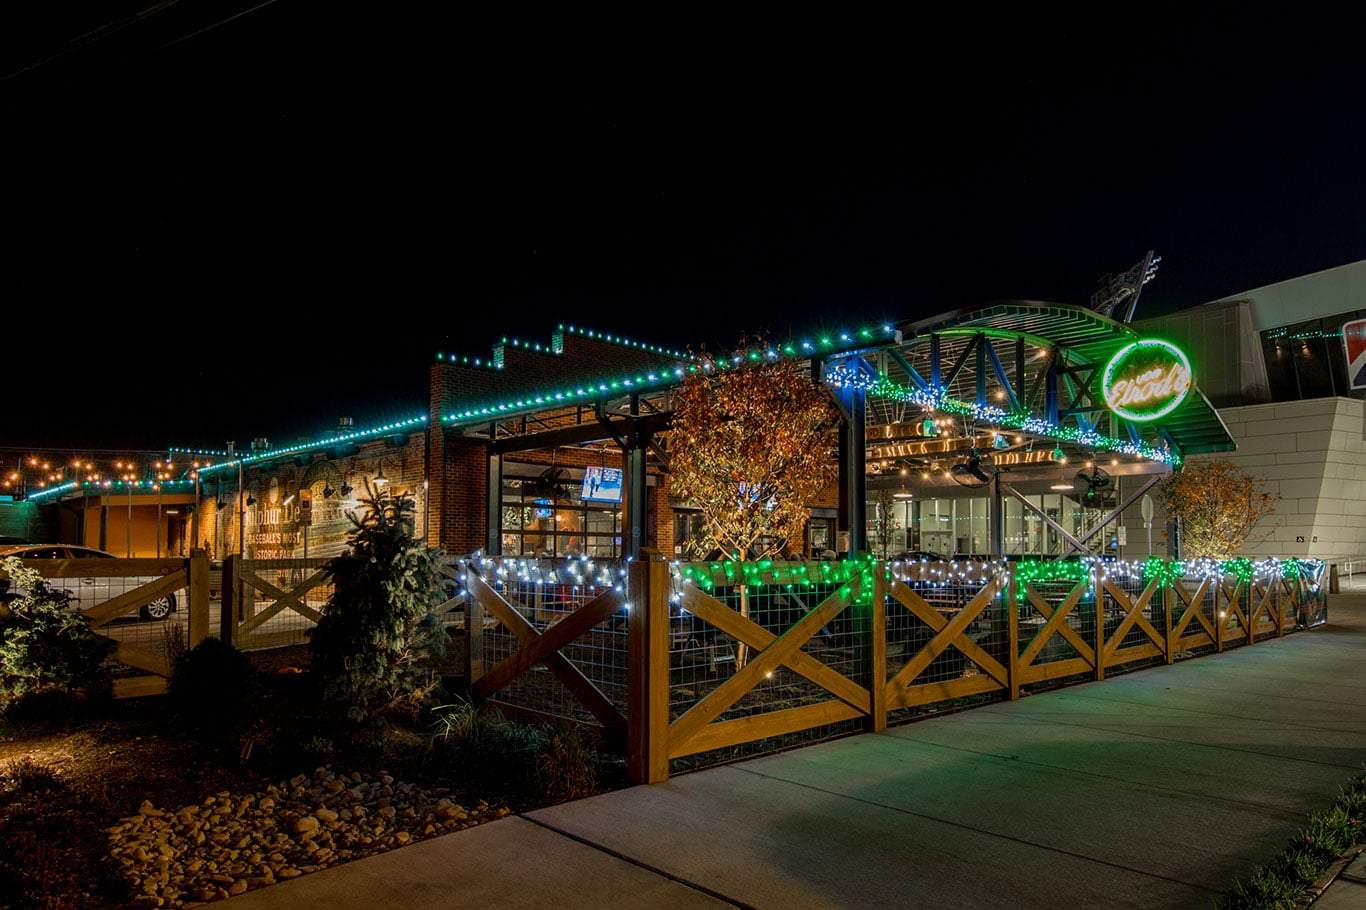 Von Elrod's Beer Garden & Sausage House Christmas Display 2017